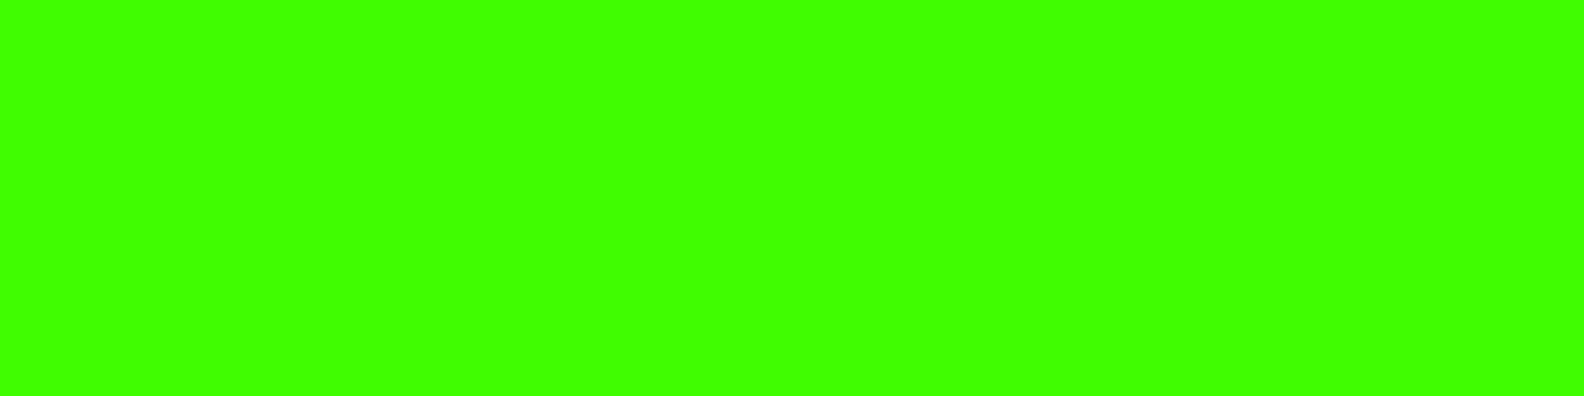 1584x396 Harlequin Solid Color Background